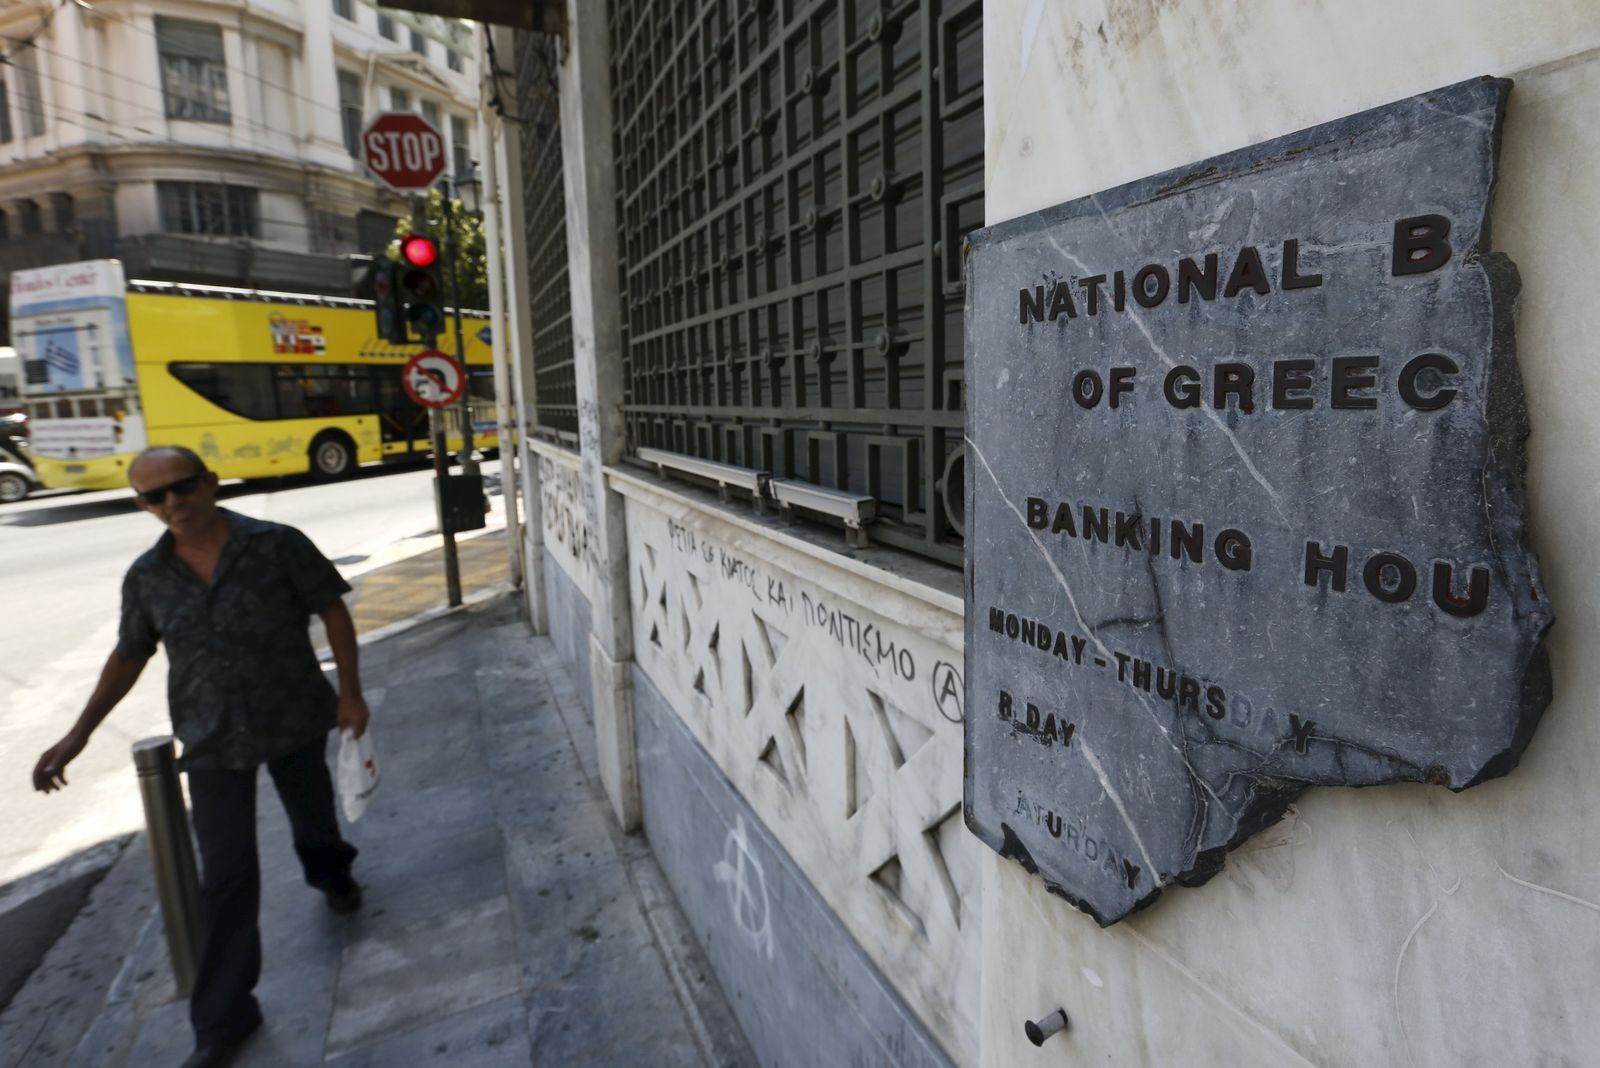 Griechenland/ Nationalbank